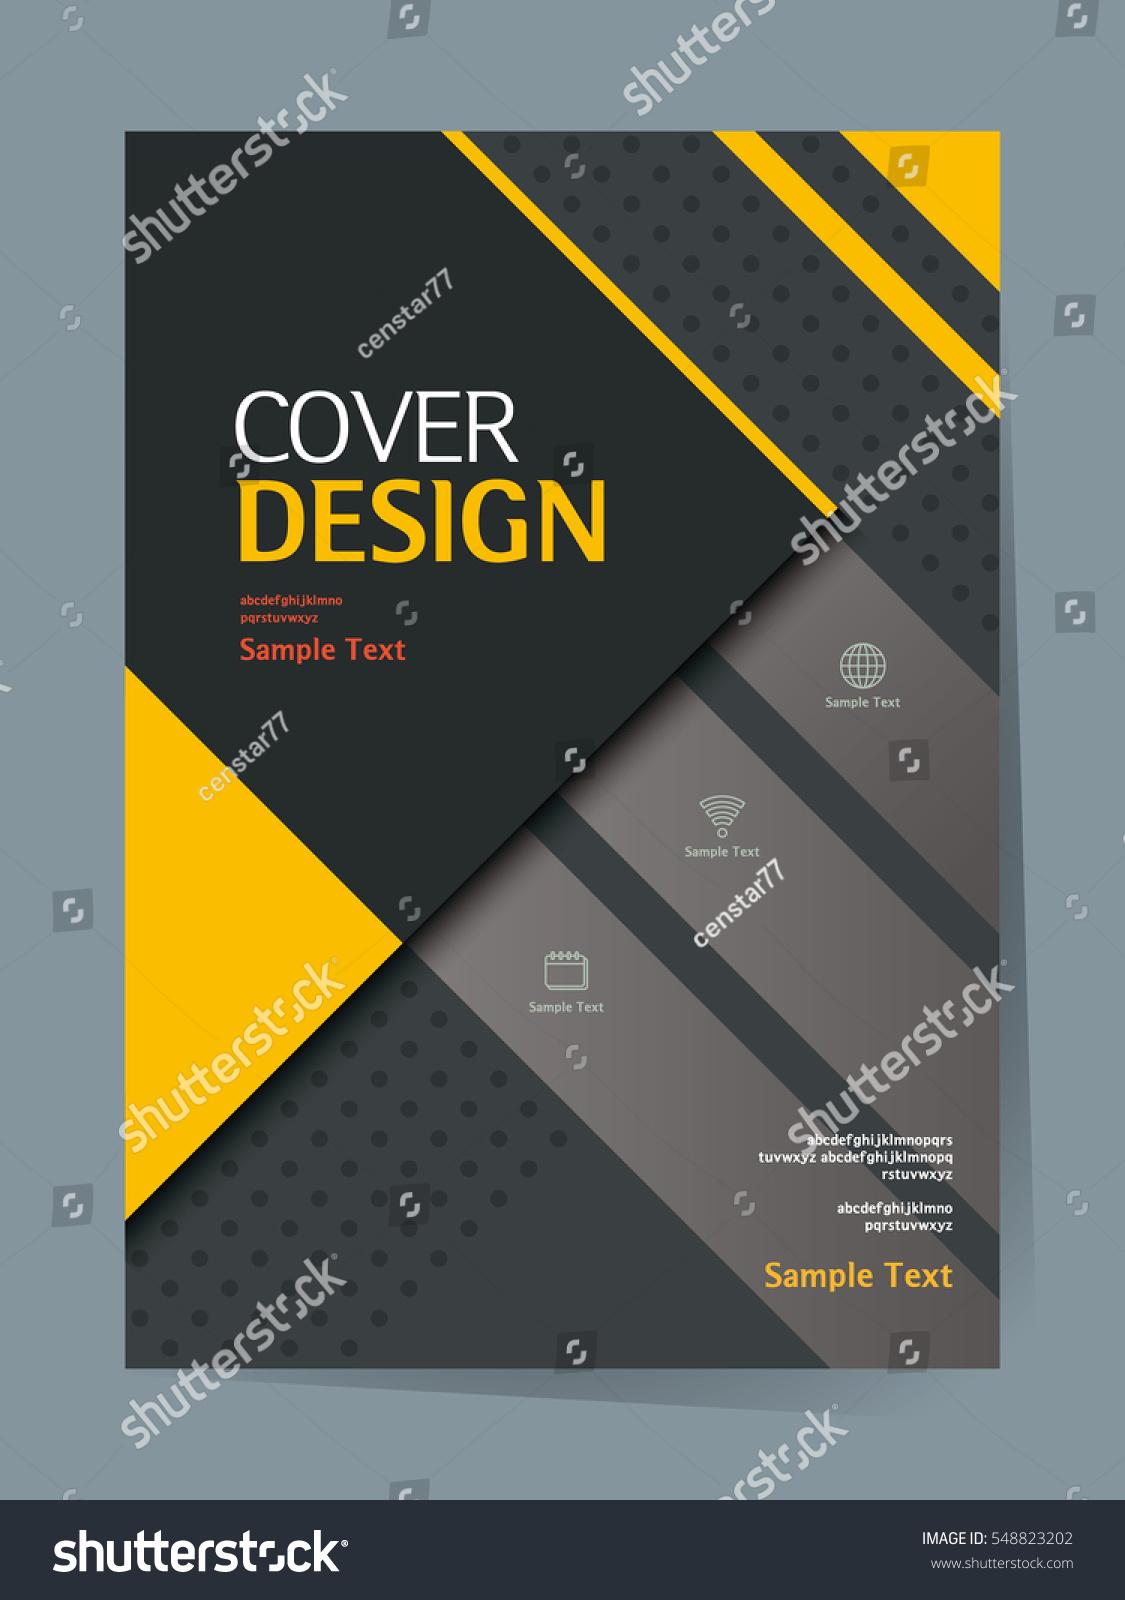 Book Cover Design Vector Template : Book cover design vector template a stock